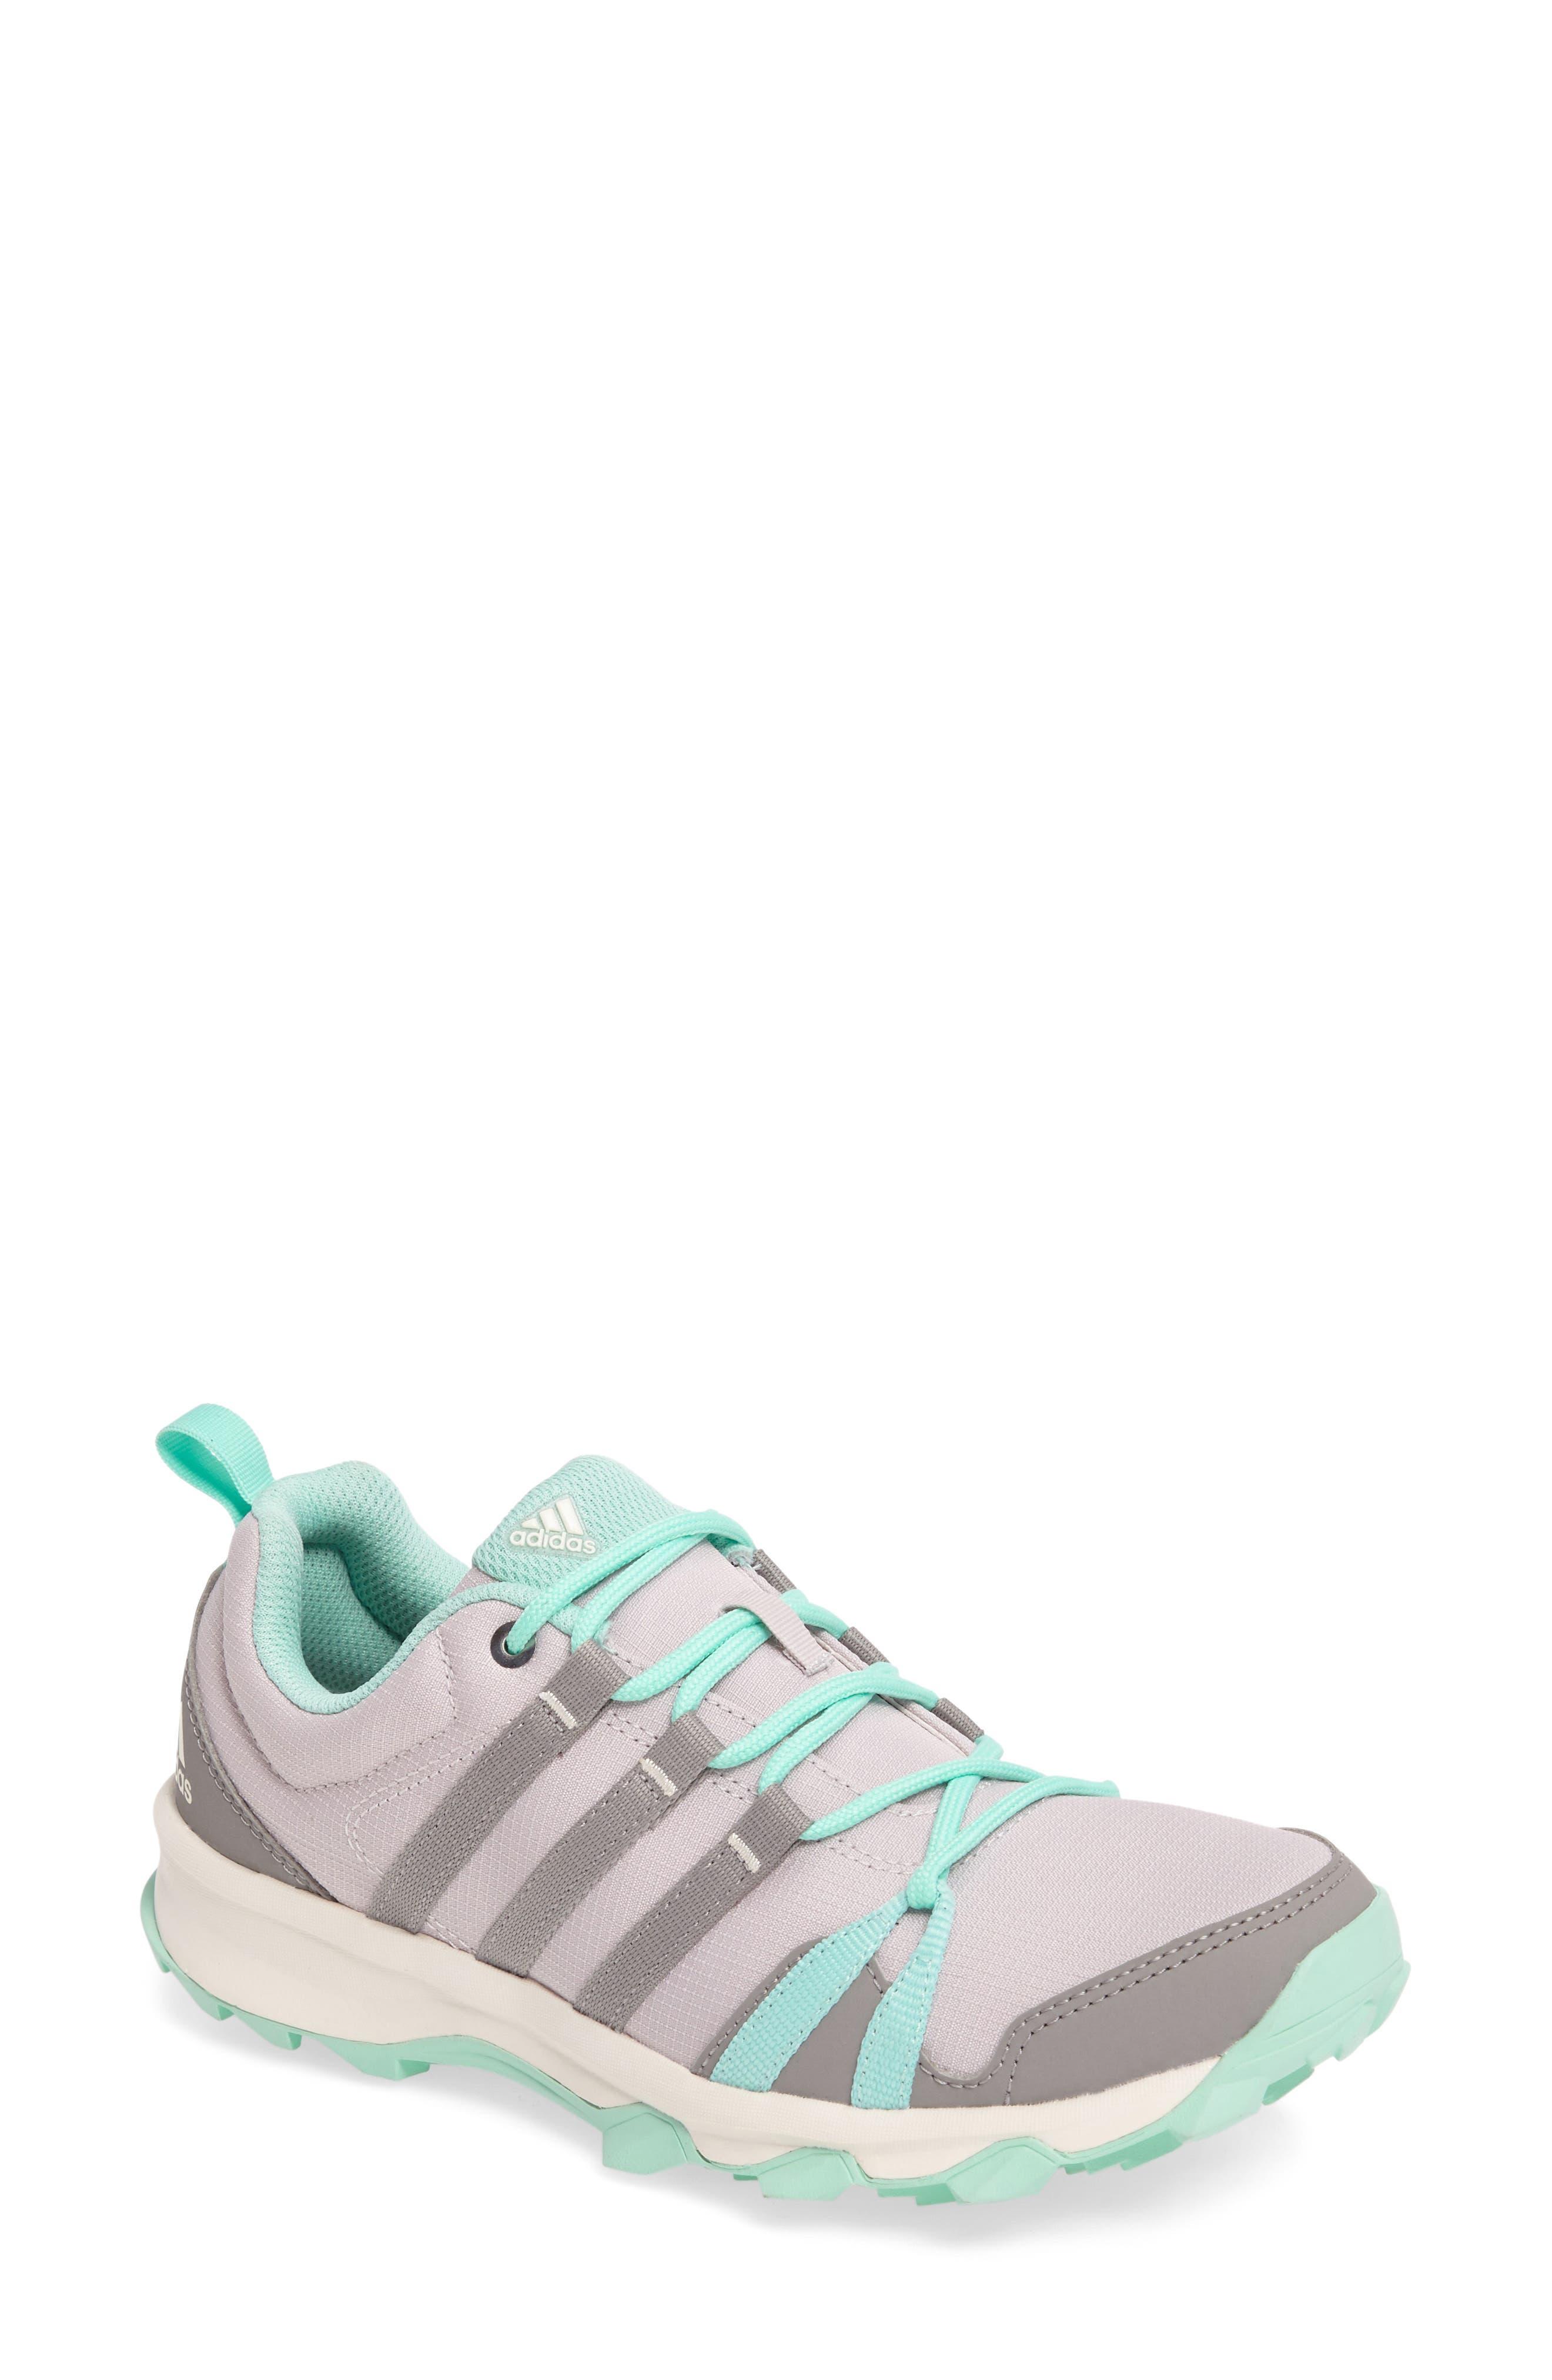 Alternate Image 1 Selected - adidas 'Tracerocker' Athletic Sneaker (Women)